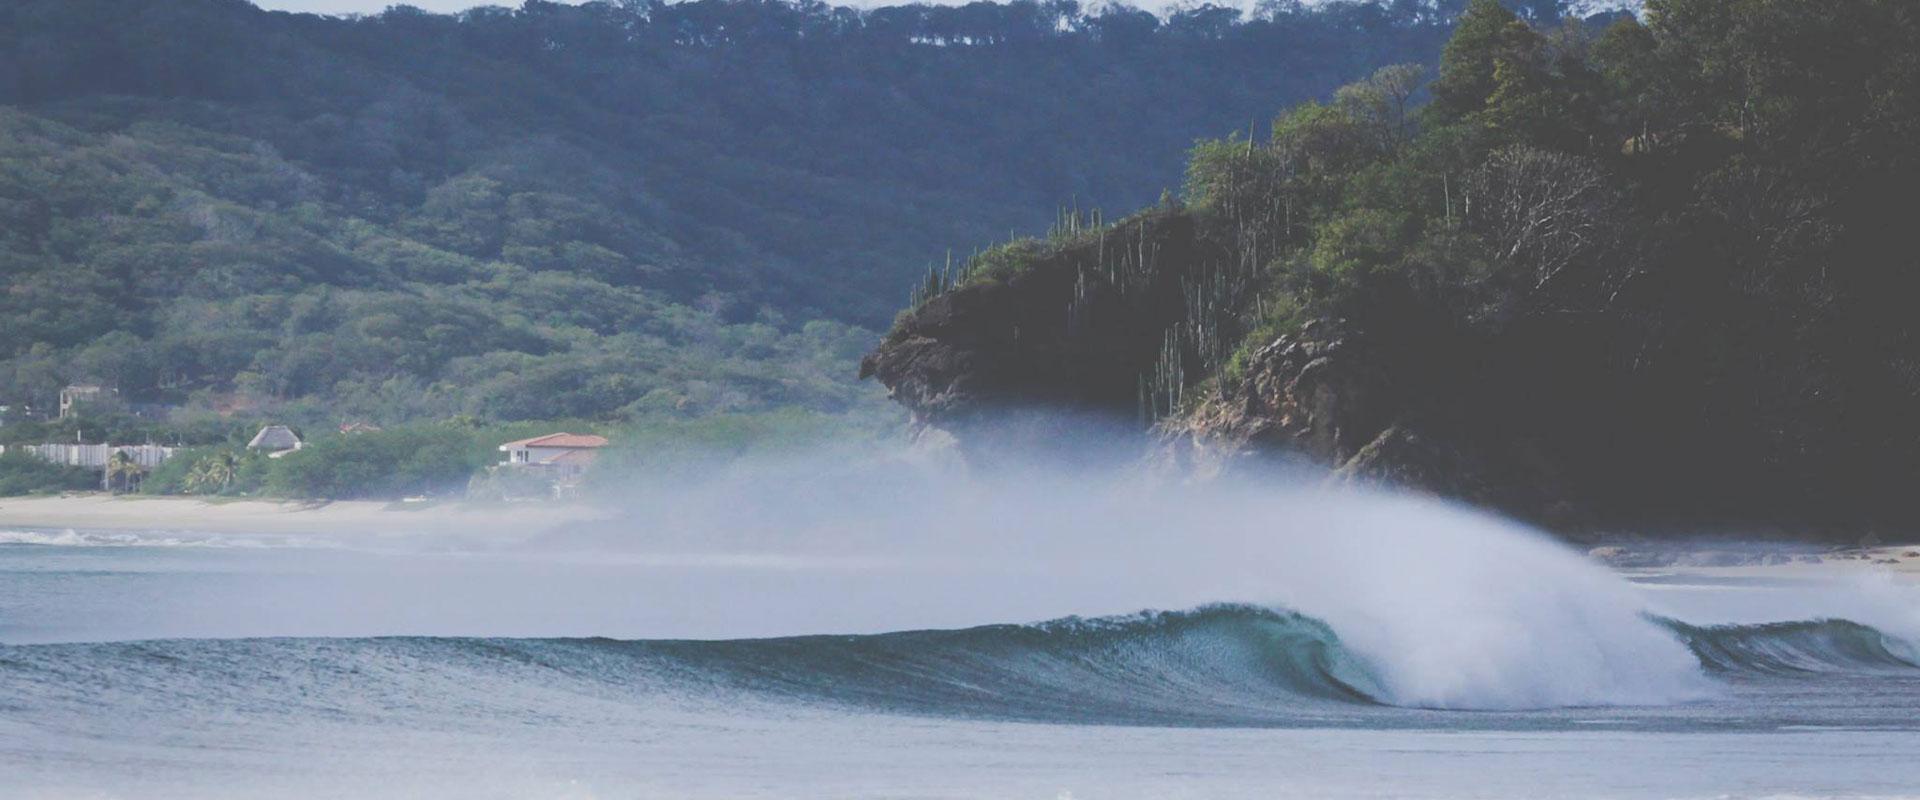 camp-de-surf-nicaragua-surf-expedition